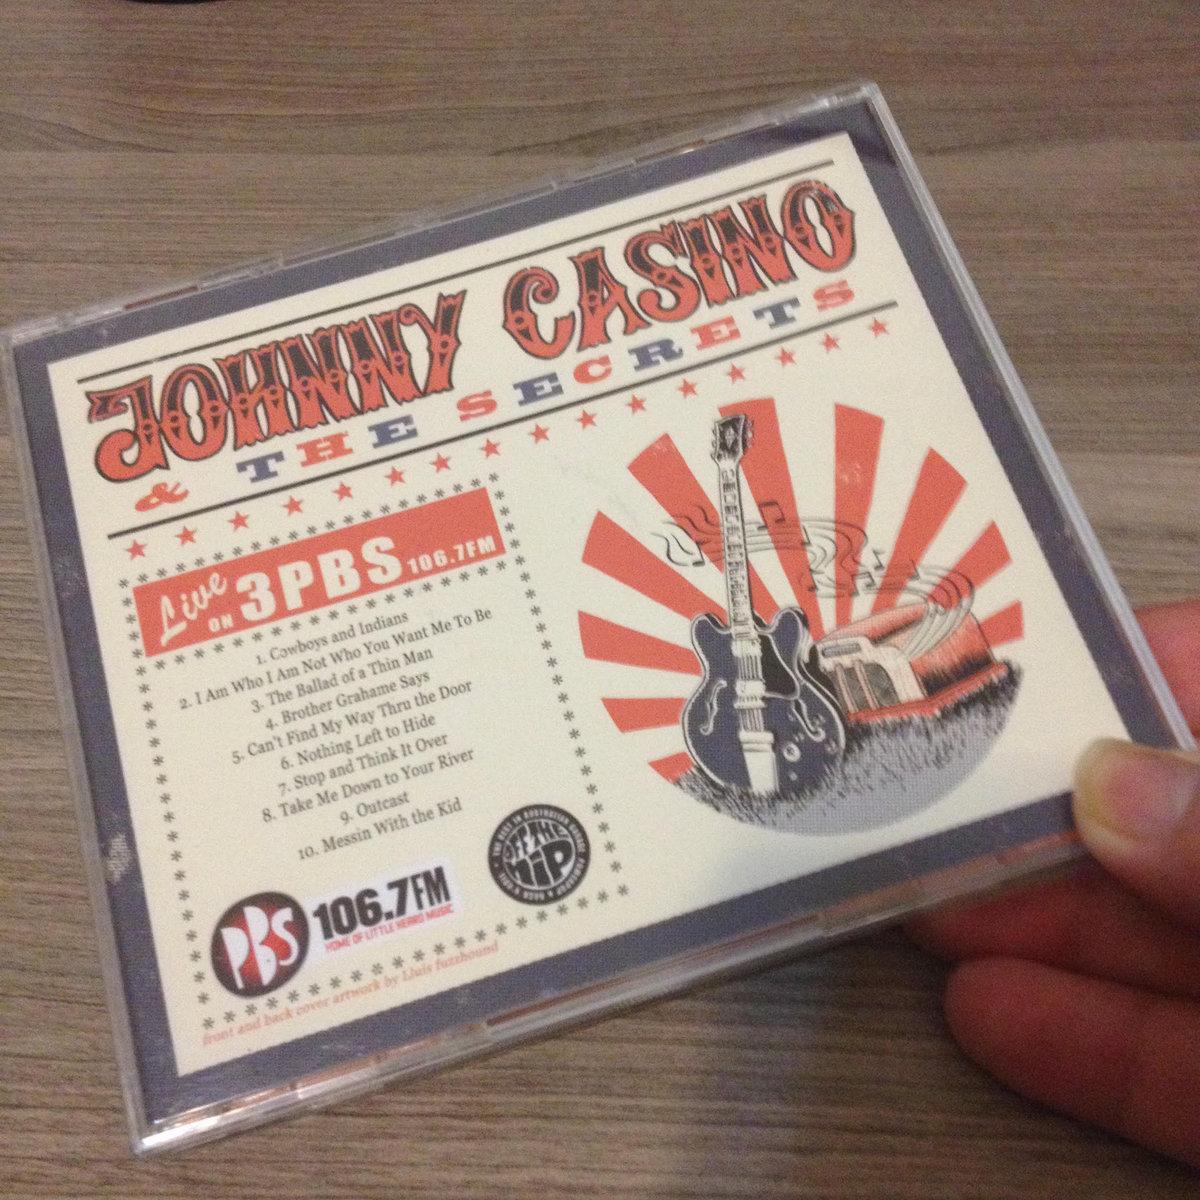 Live at 3pbs radio | JOHNNY CASINO